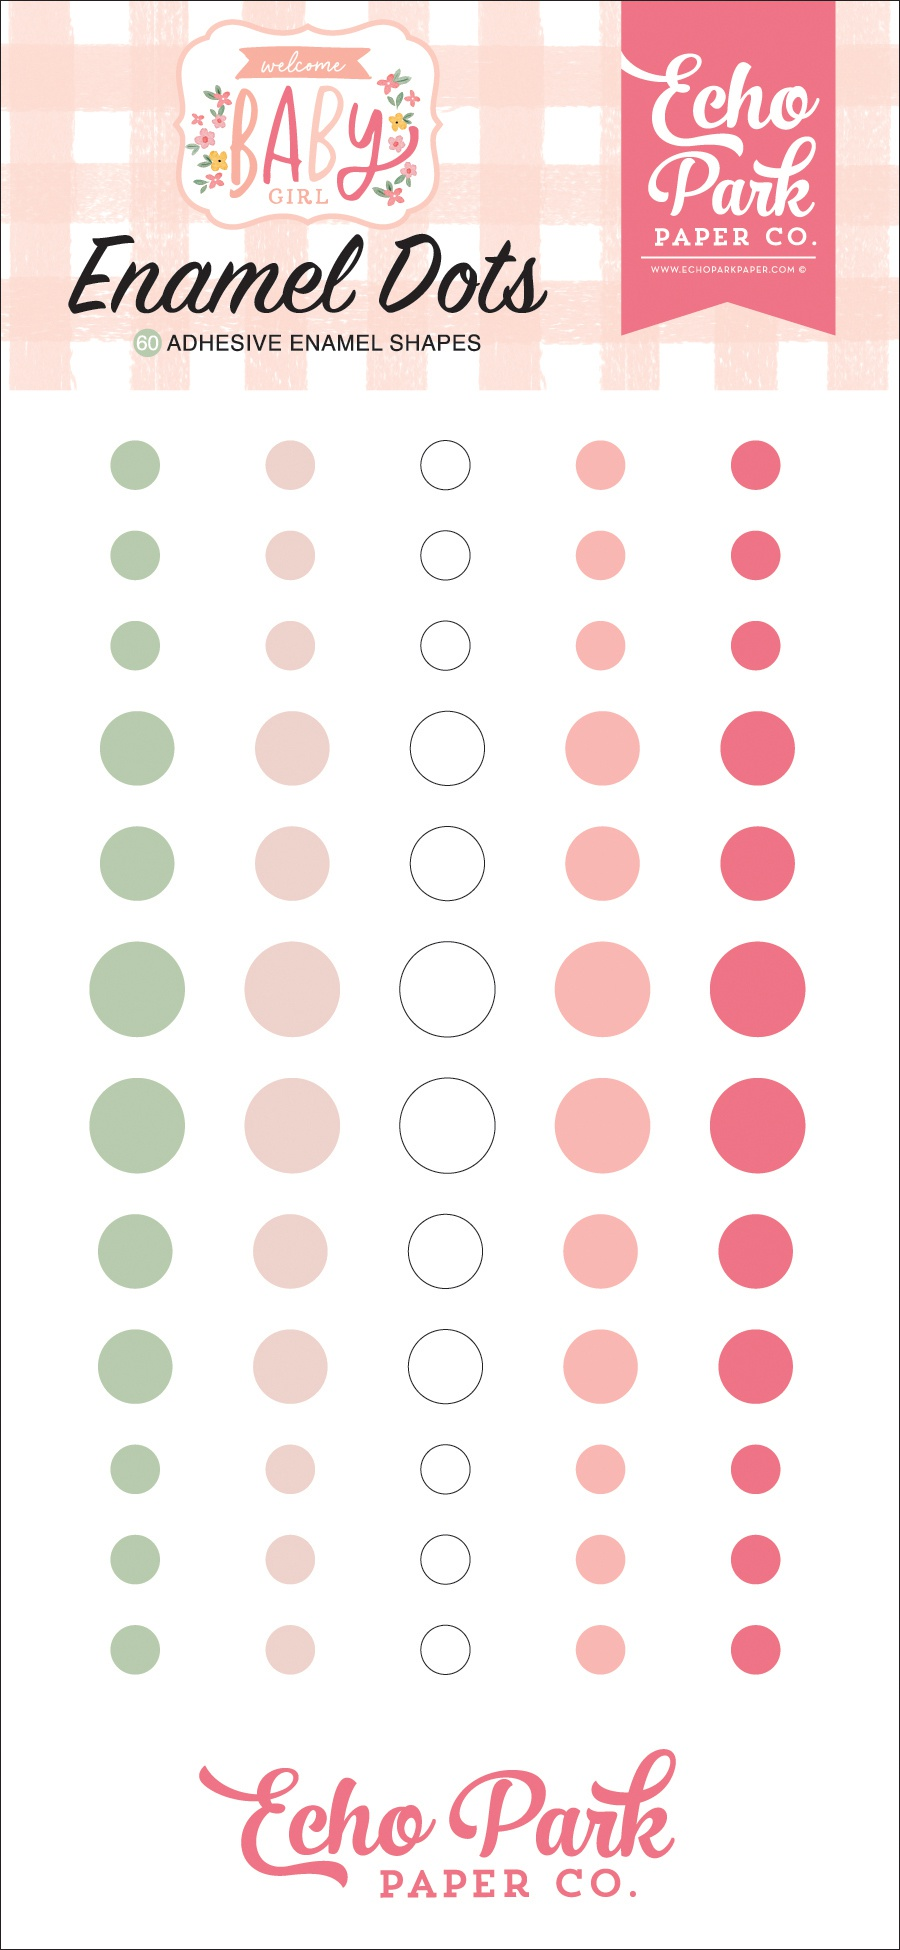 Echo Park Adhesive Enamel Dots 60/Pkg-Welcome Baby Girl